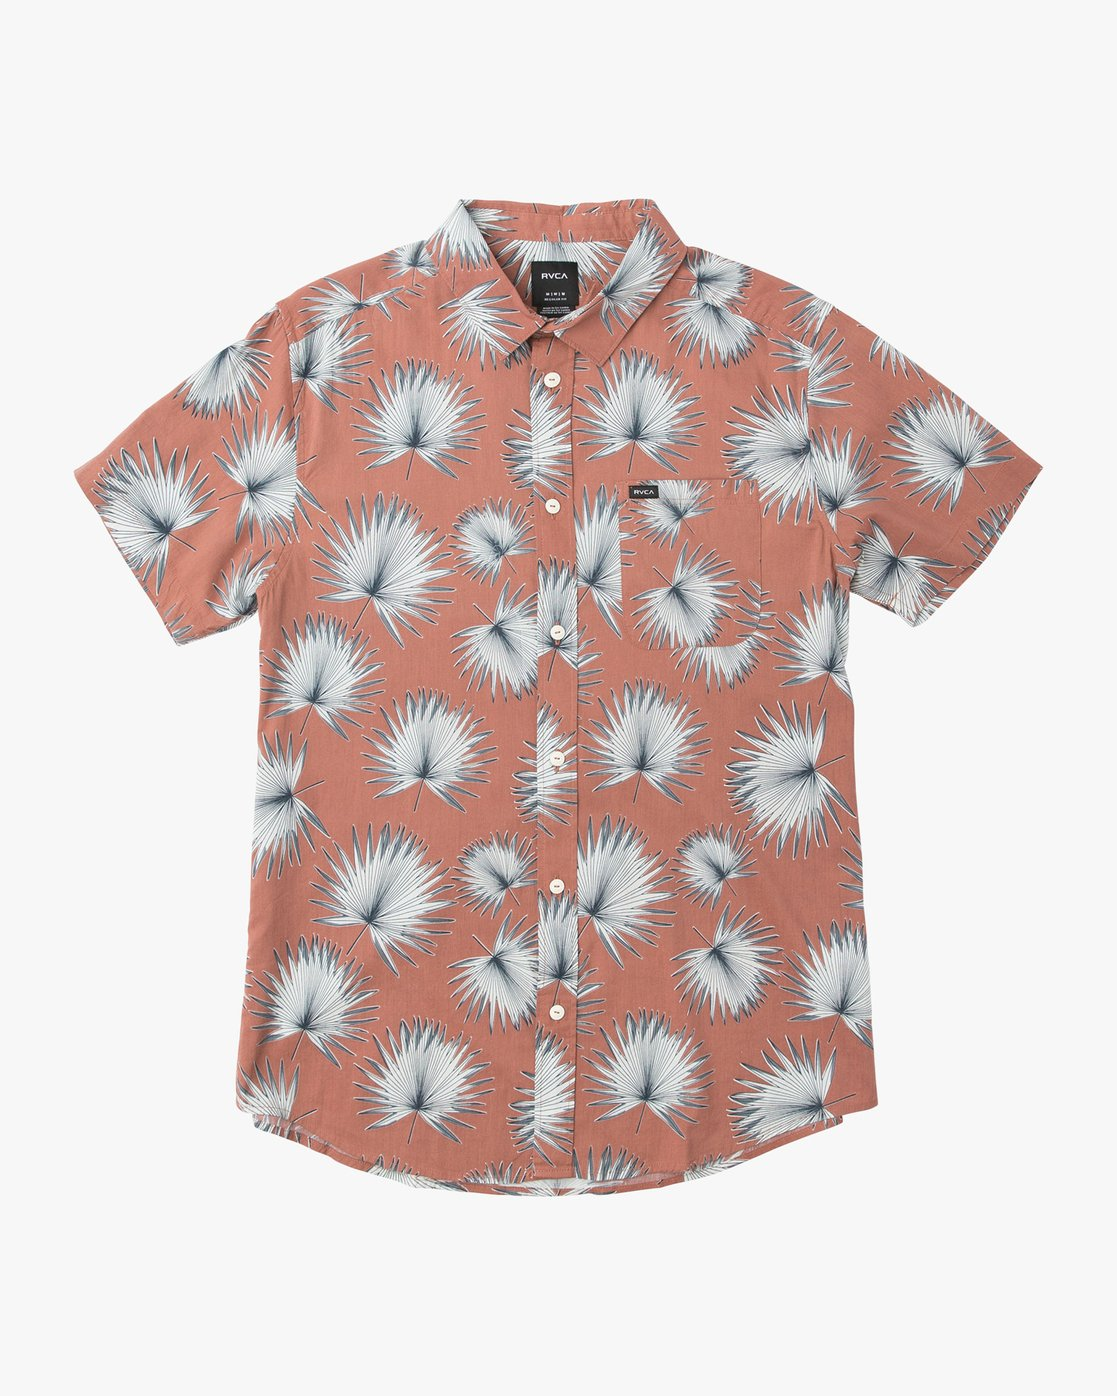 0 Palms Printed Button-Up Shirt Brown M512QRPA RVCA